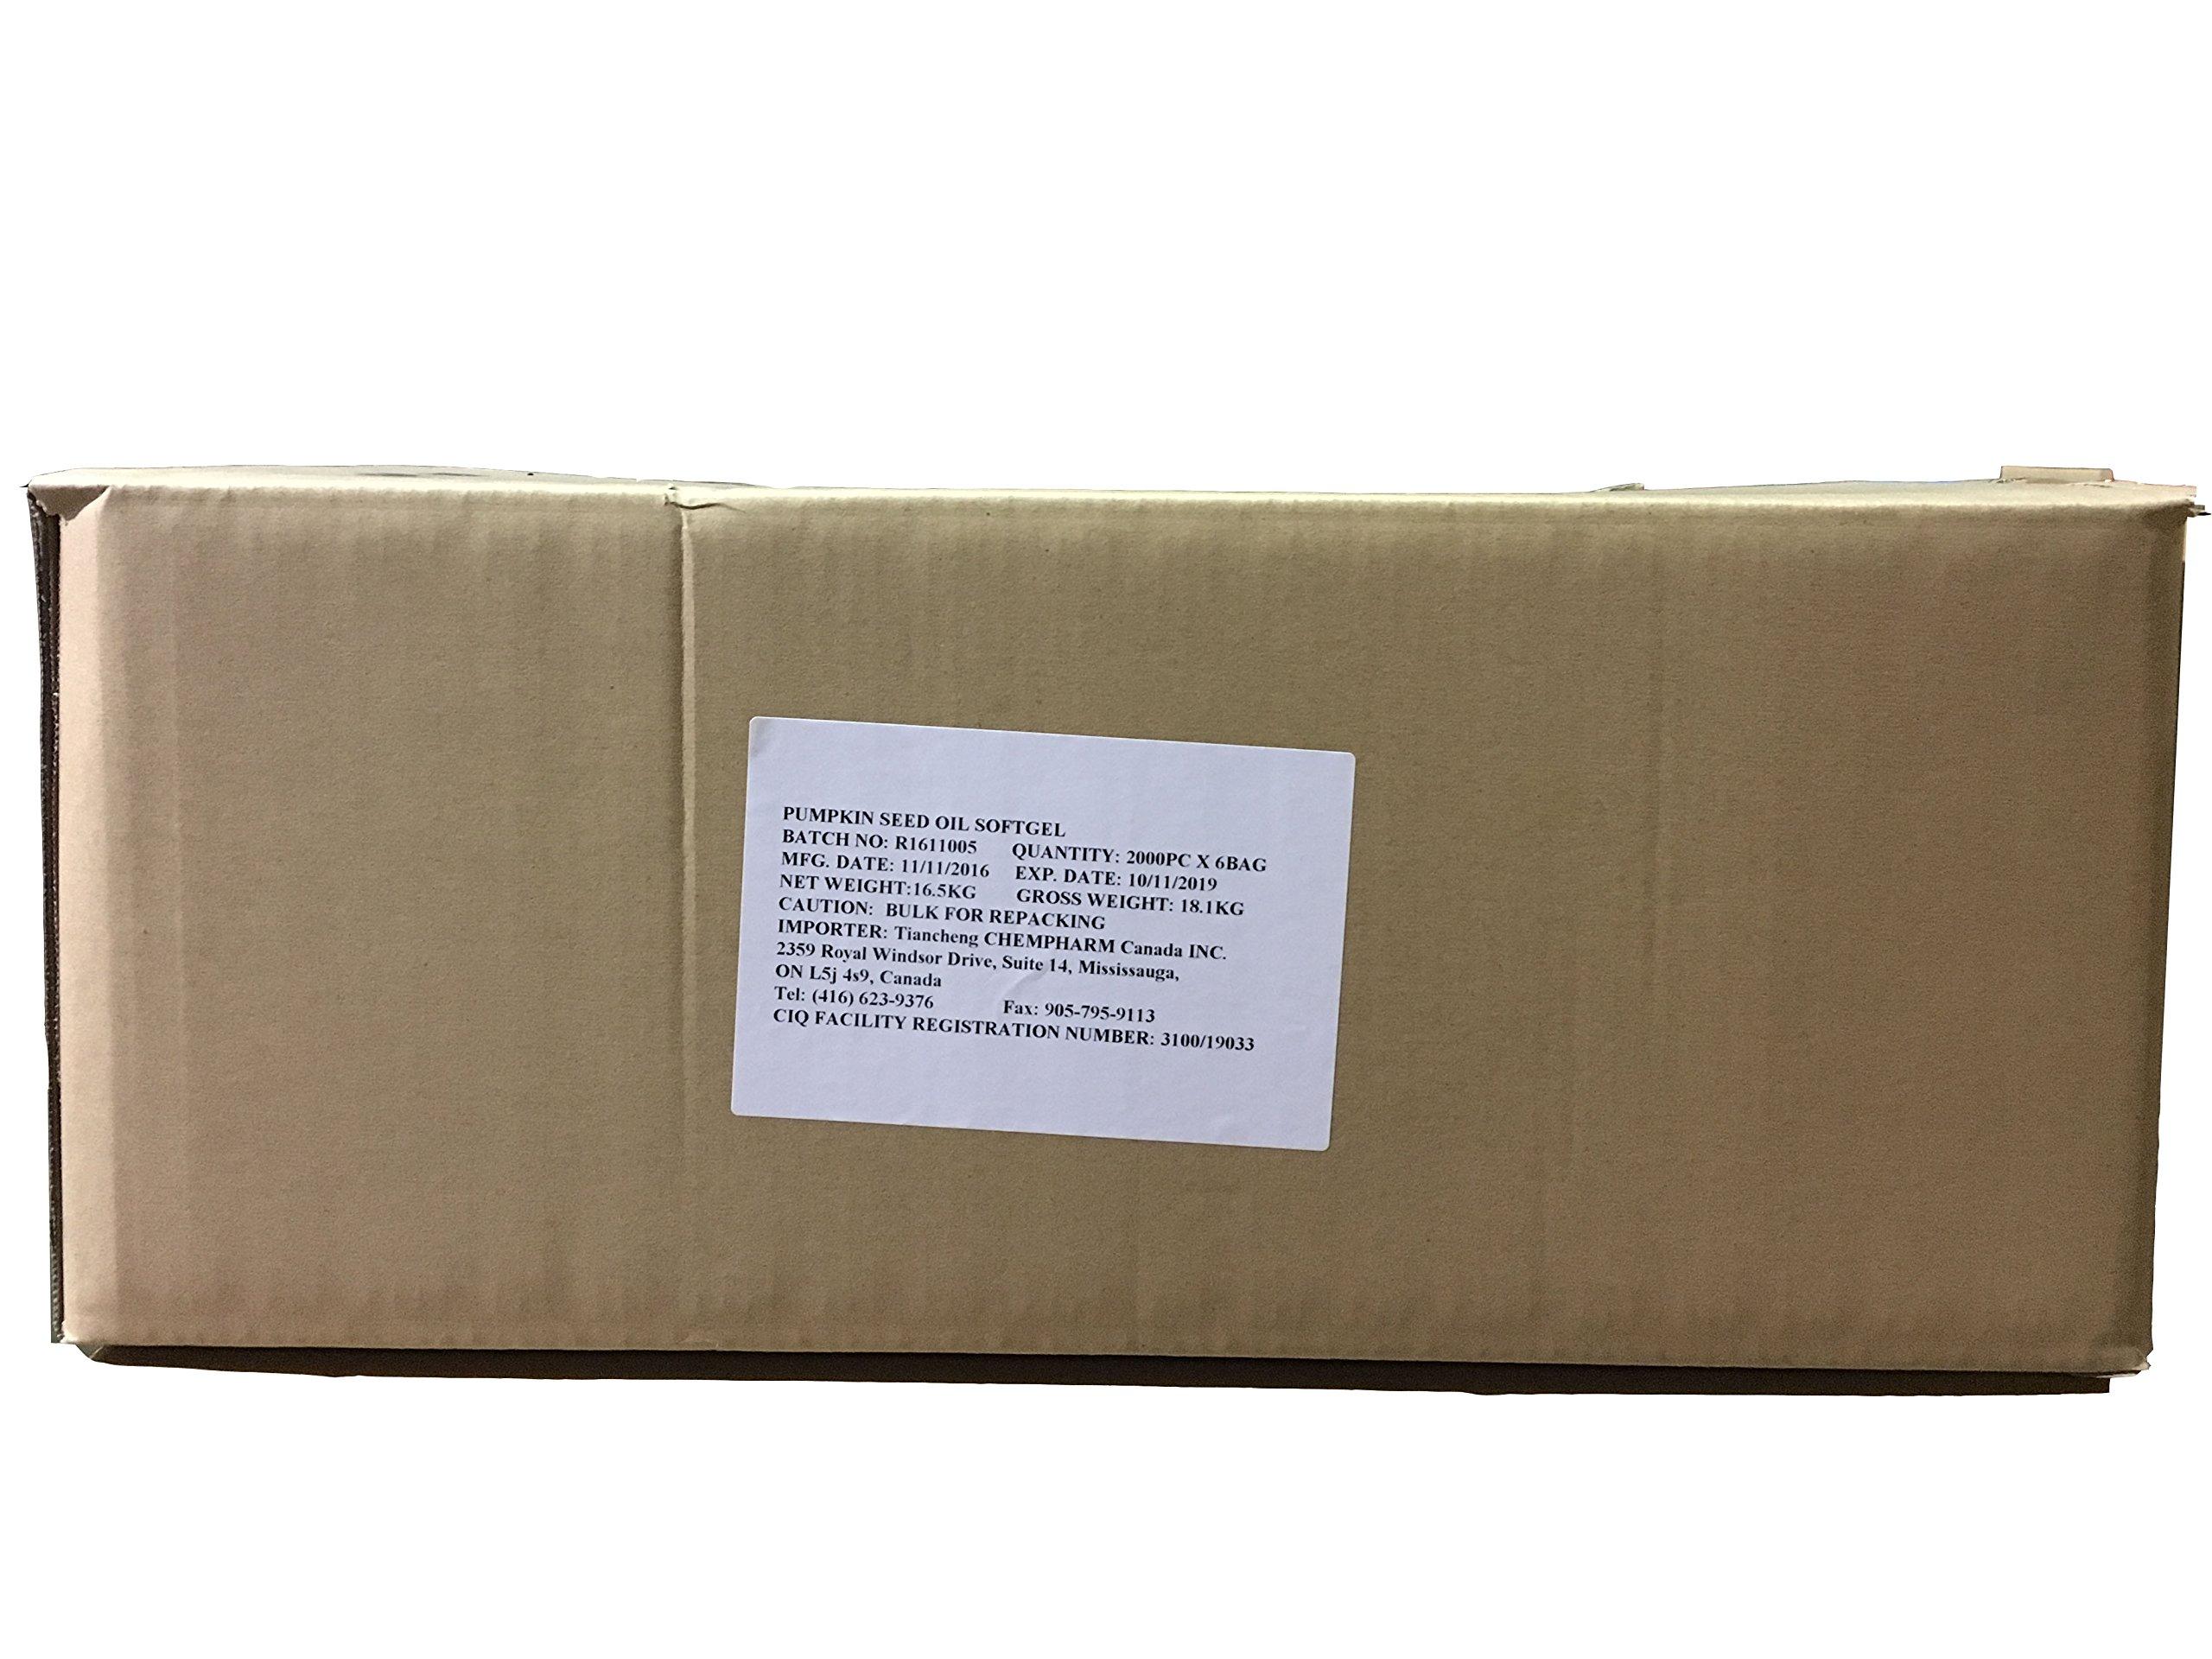 Etherea Pumpkin Seed Oil 1000mg softgel Bulk (12000 Softgels/Box)